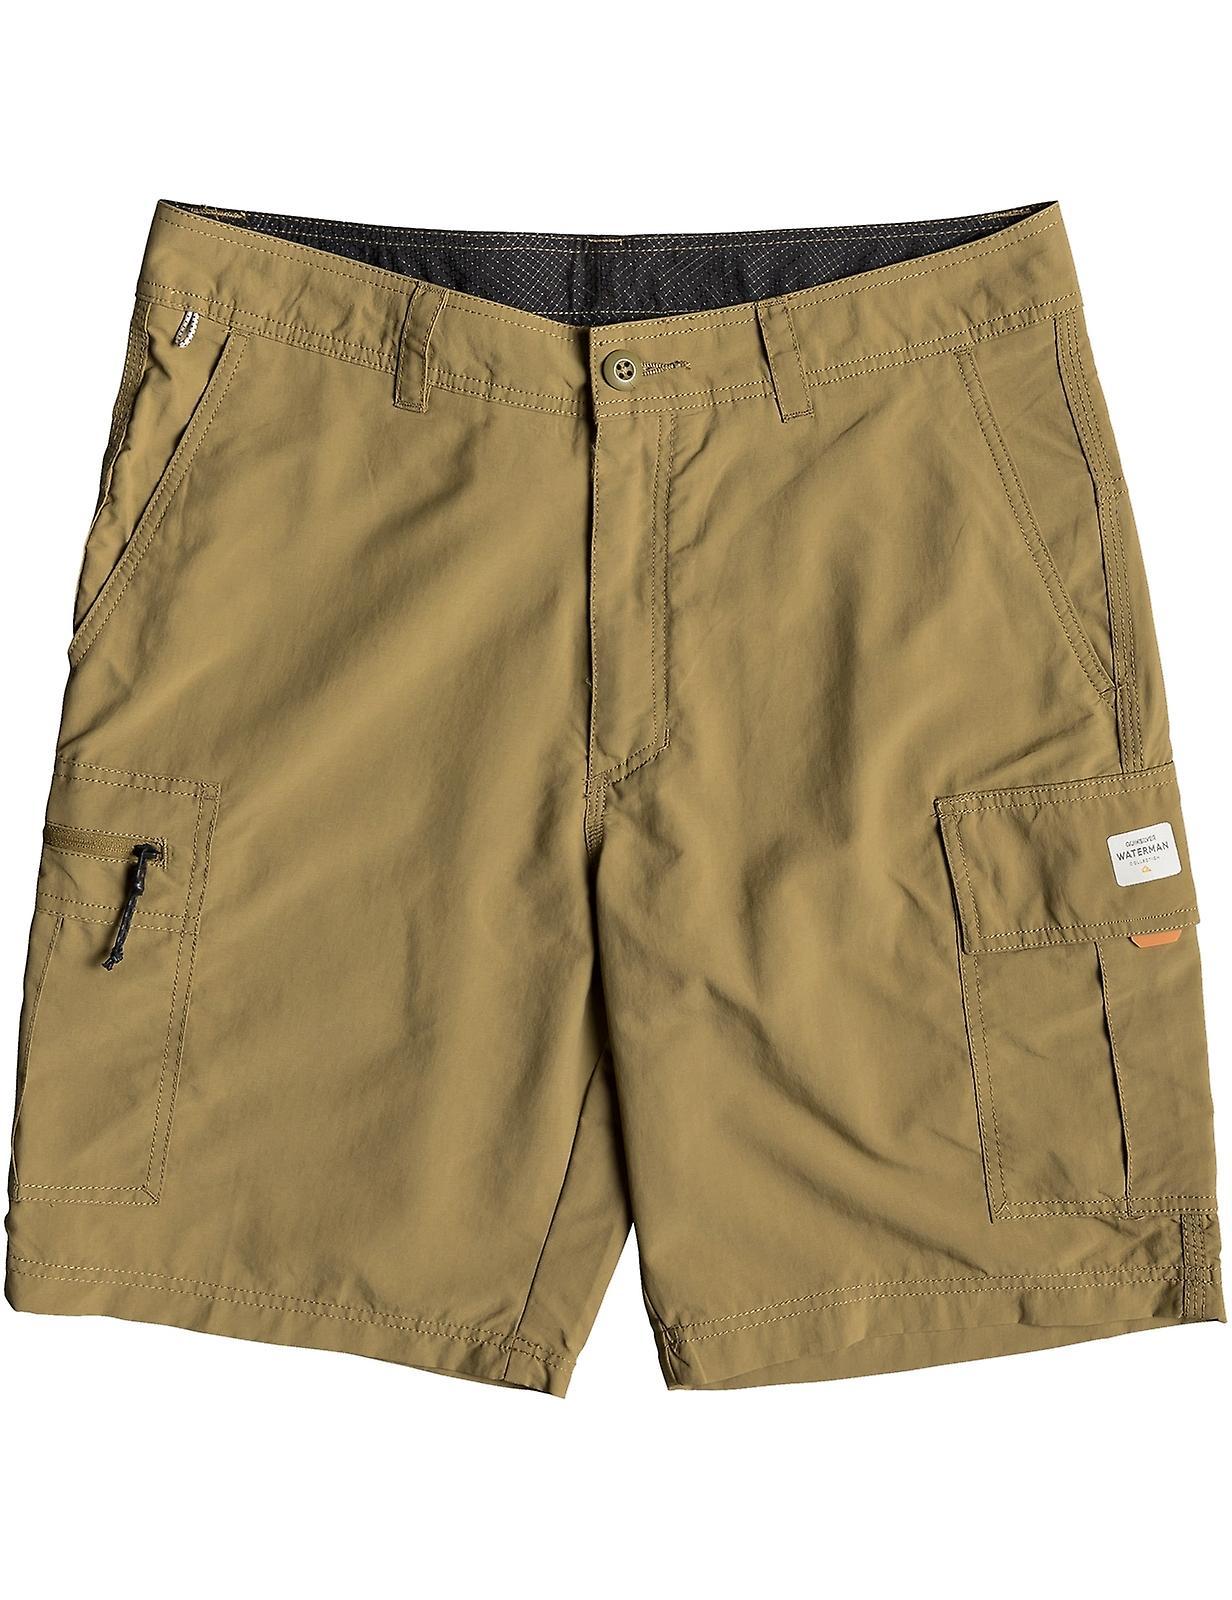 Quikargent Waterhomme Skipper Cargo Shorts